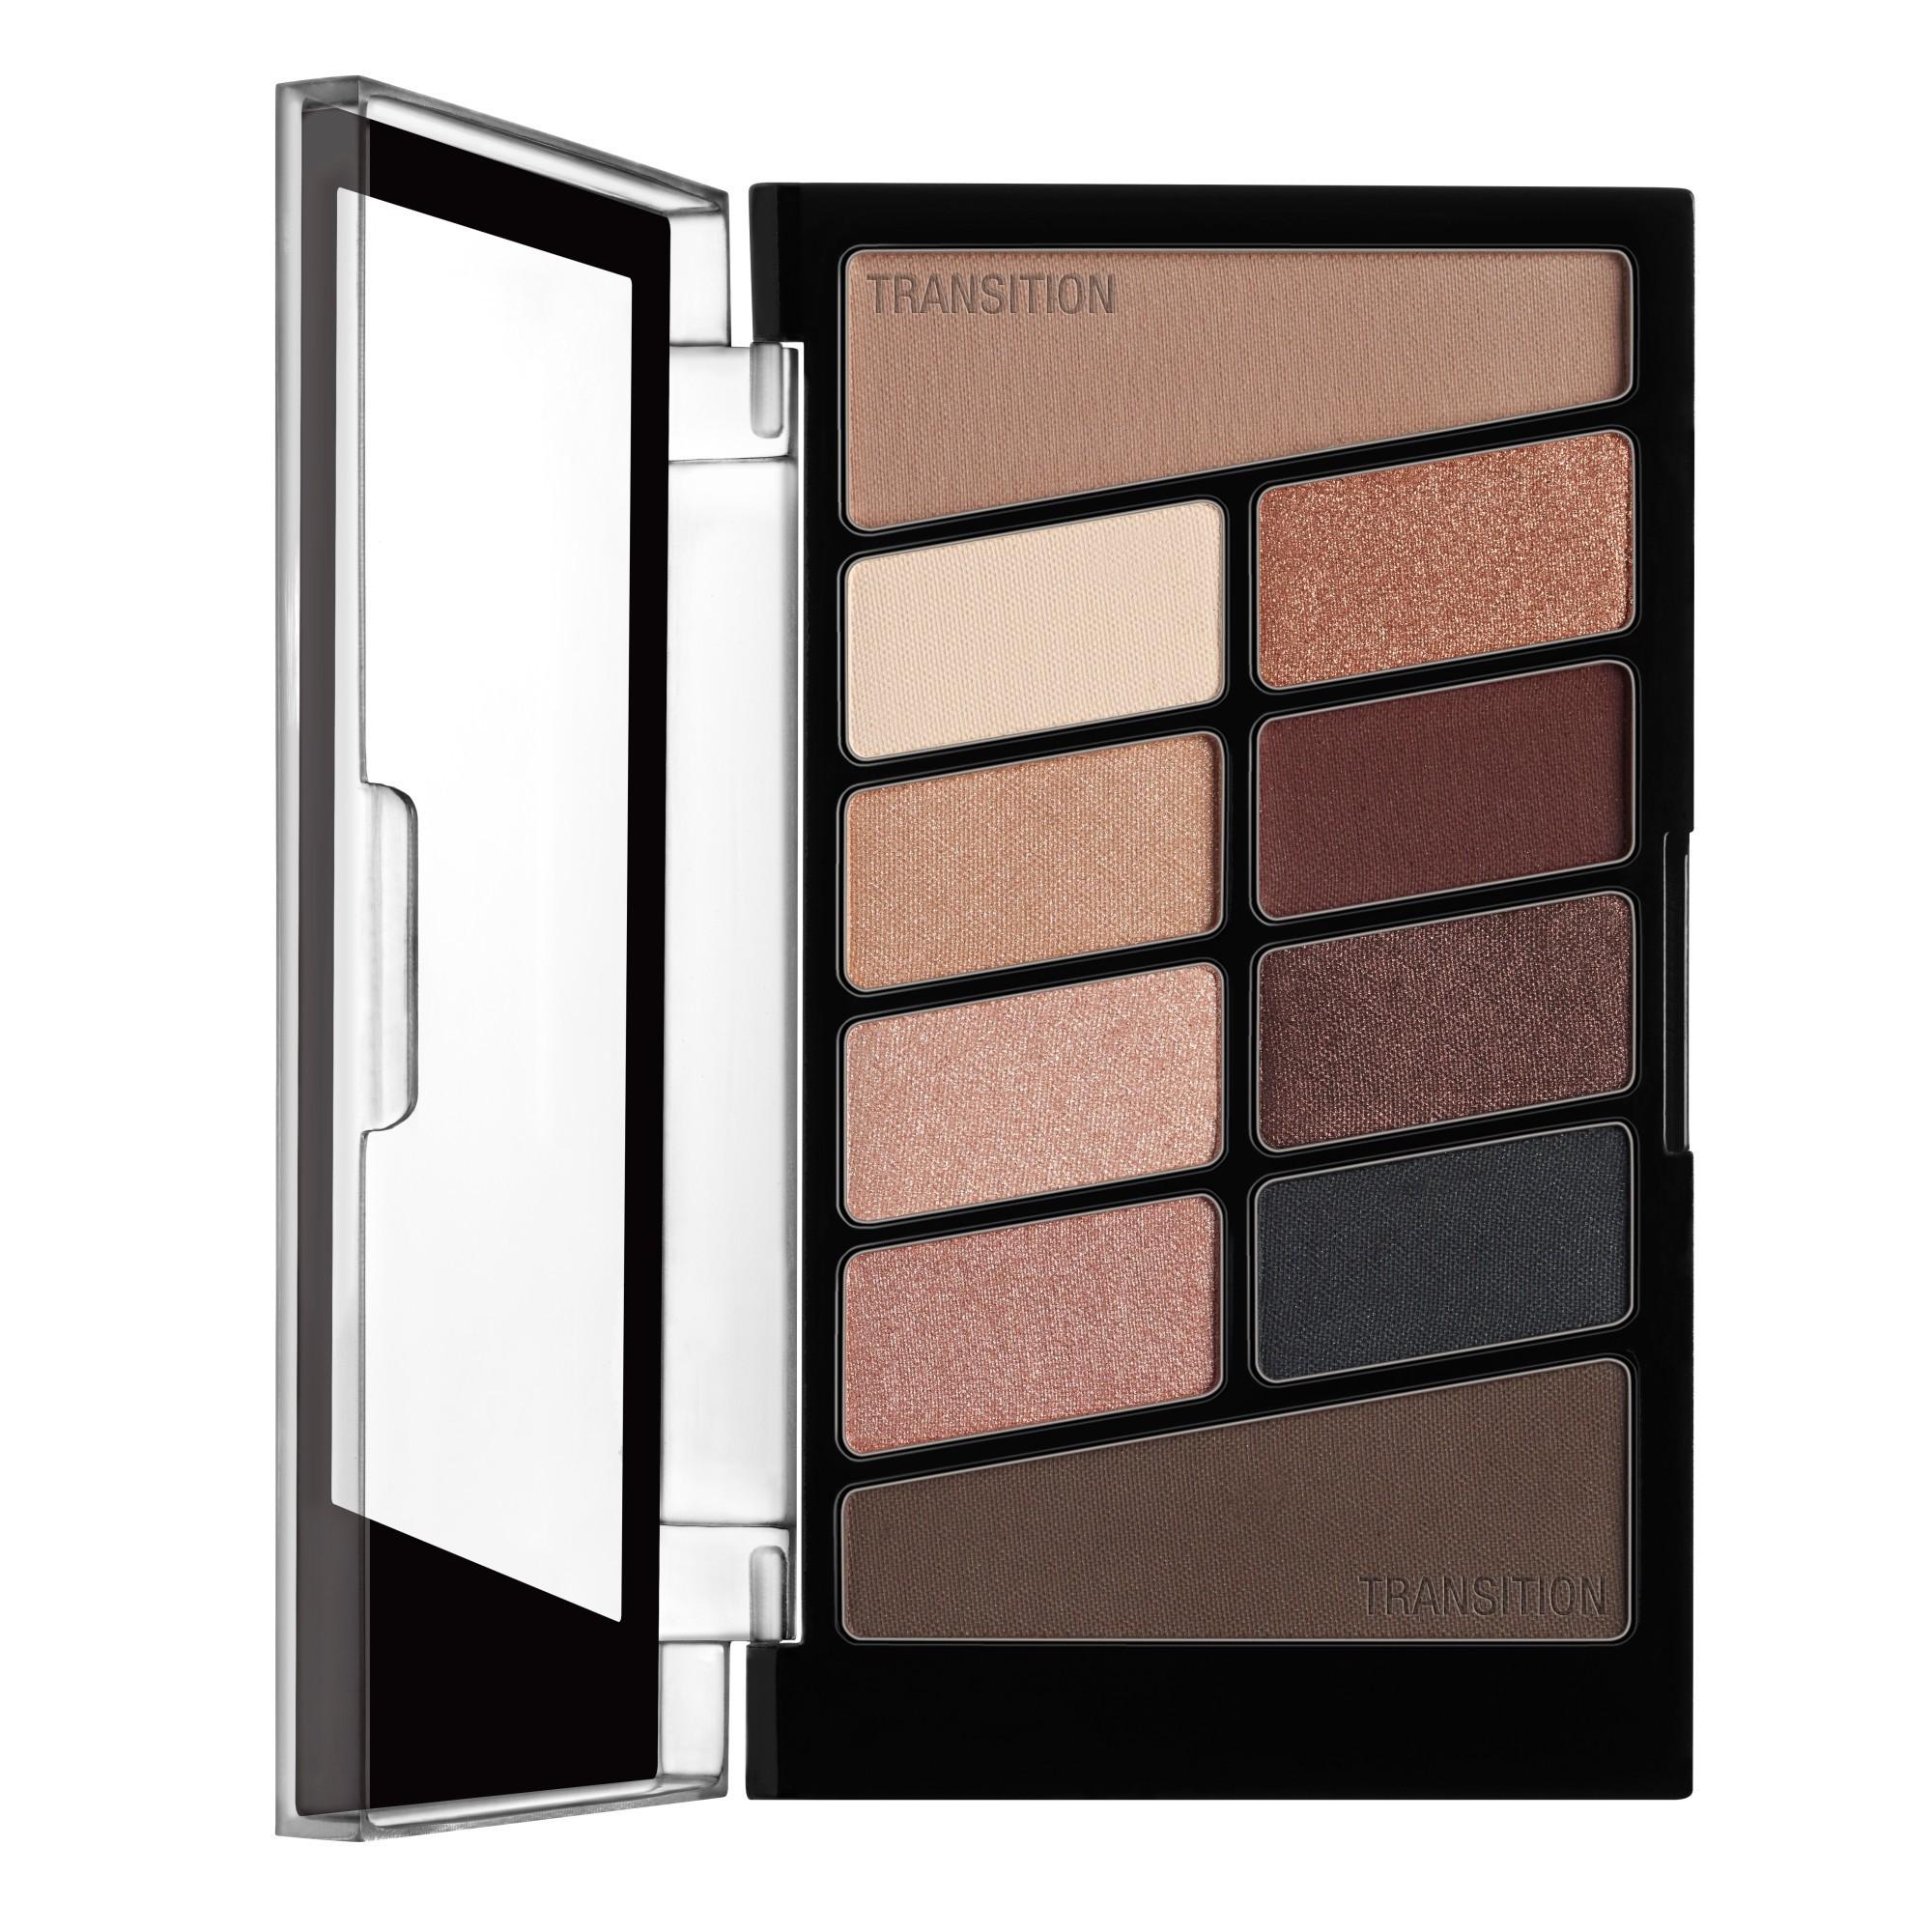 Wet n Wild Color Icon 10-Pan Eyeshadow Palette Nude Awakening - 0.3oz